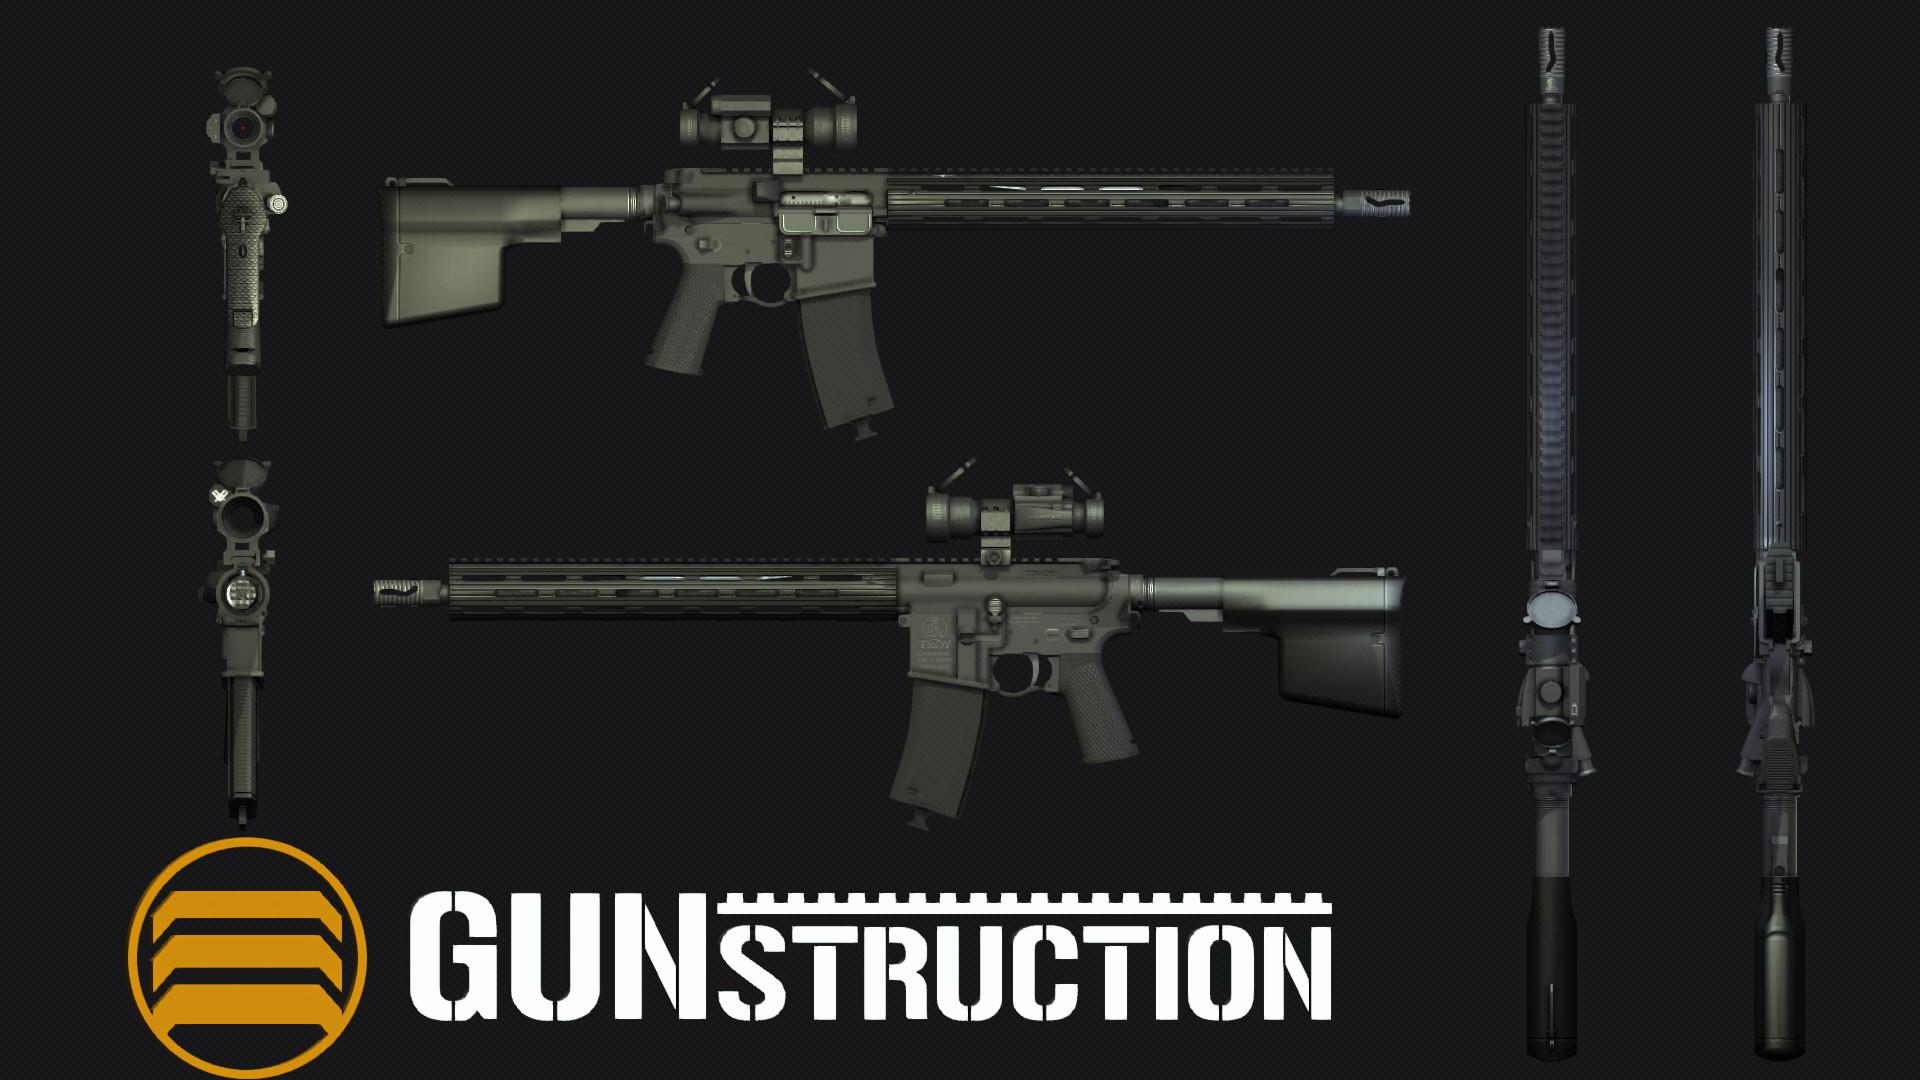 Jose dieck exp gunstruction